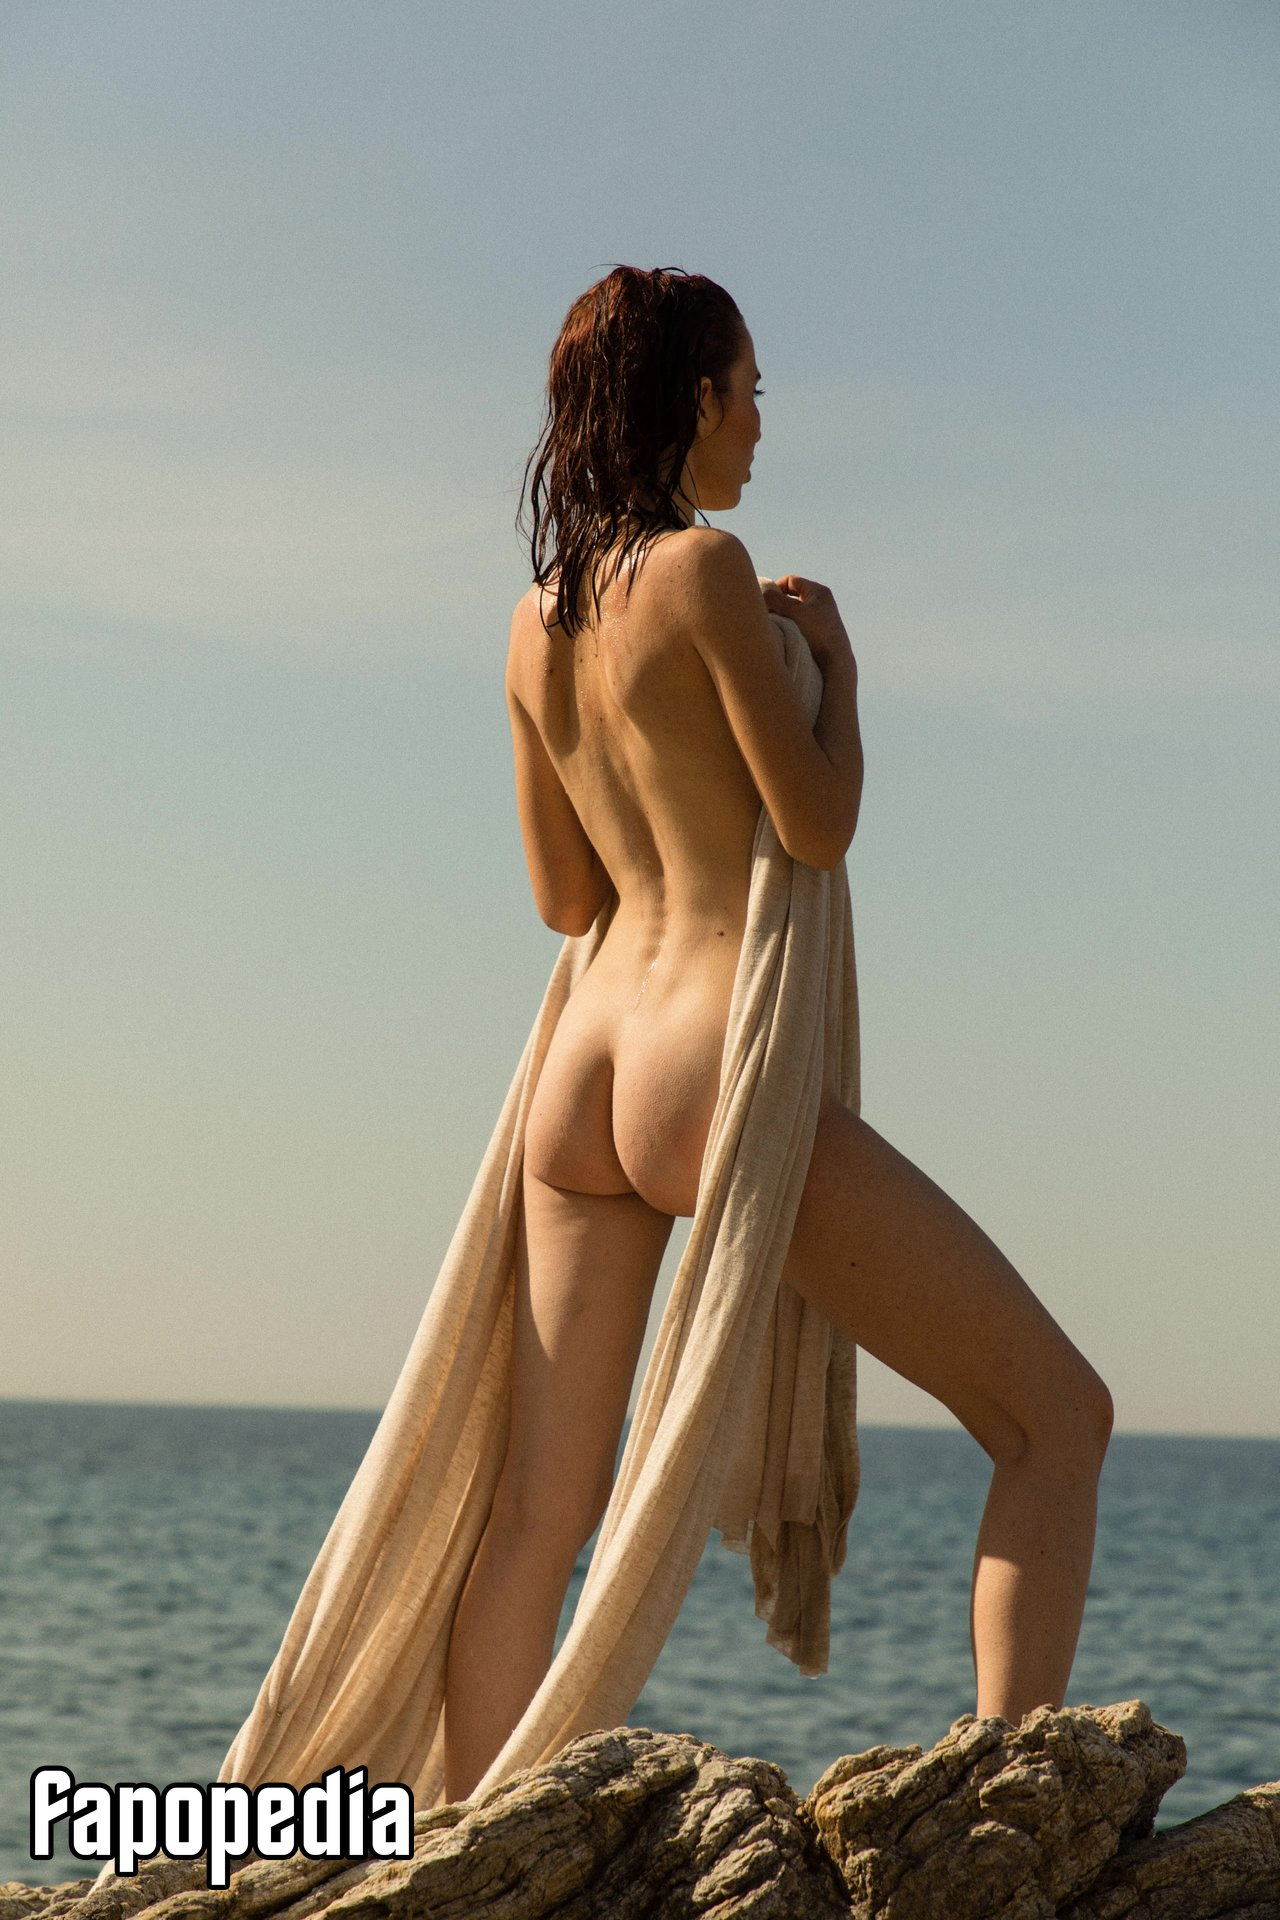 Ehresmann Amber  nackt Noelle Free Amber